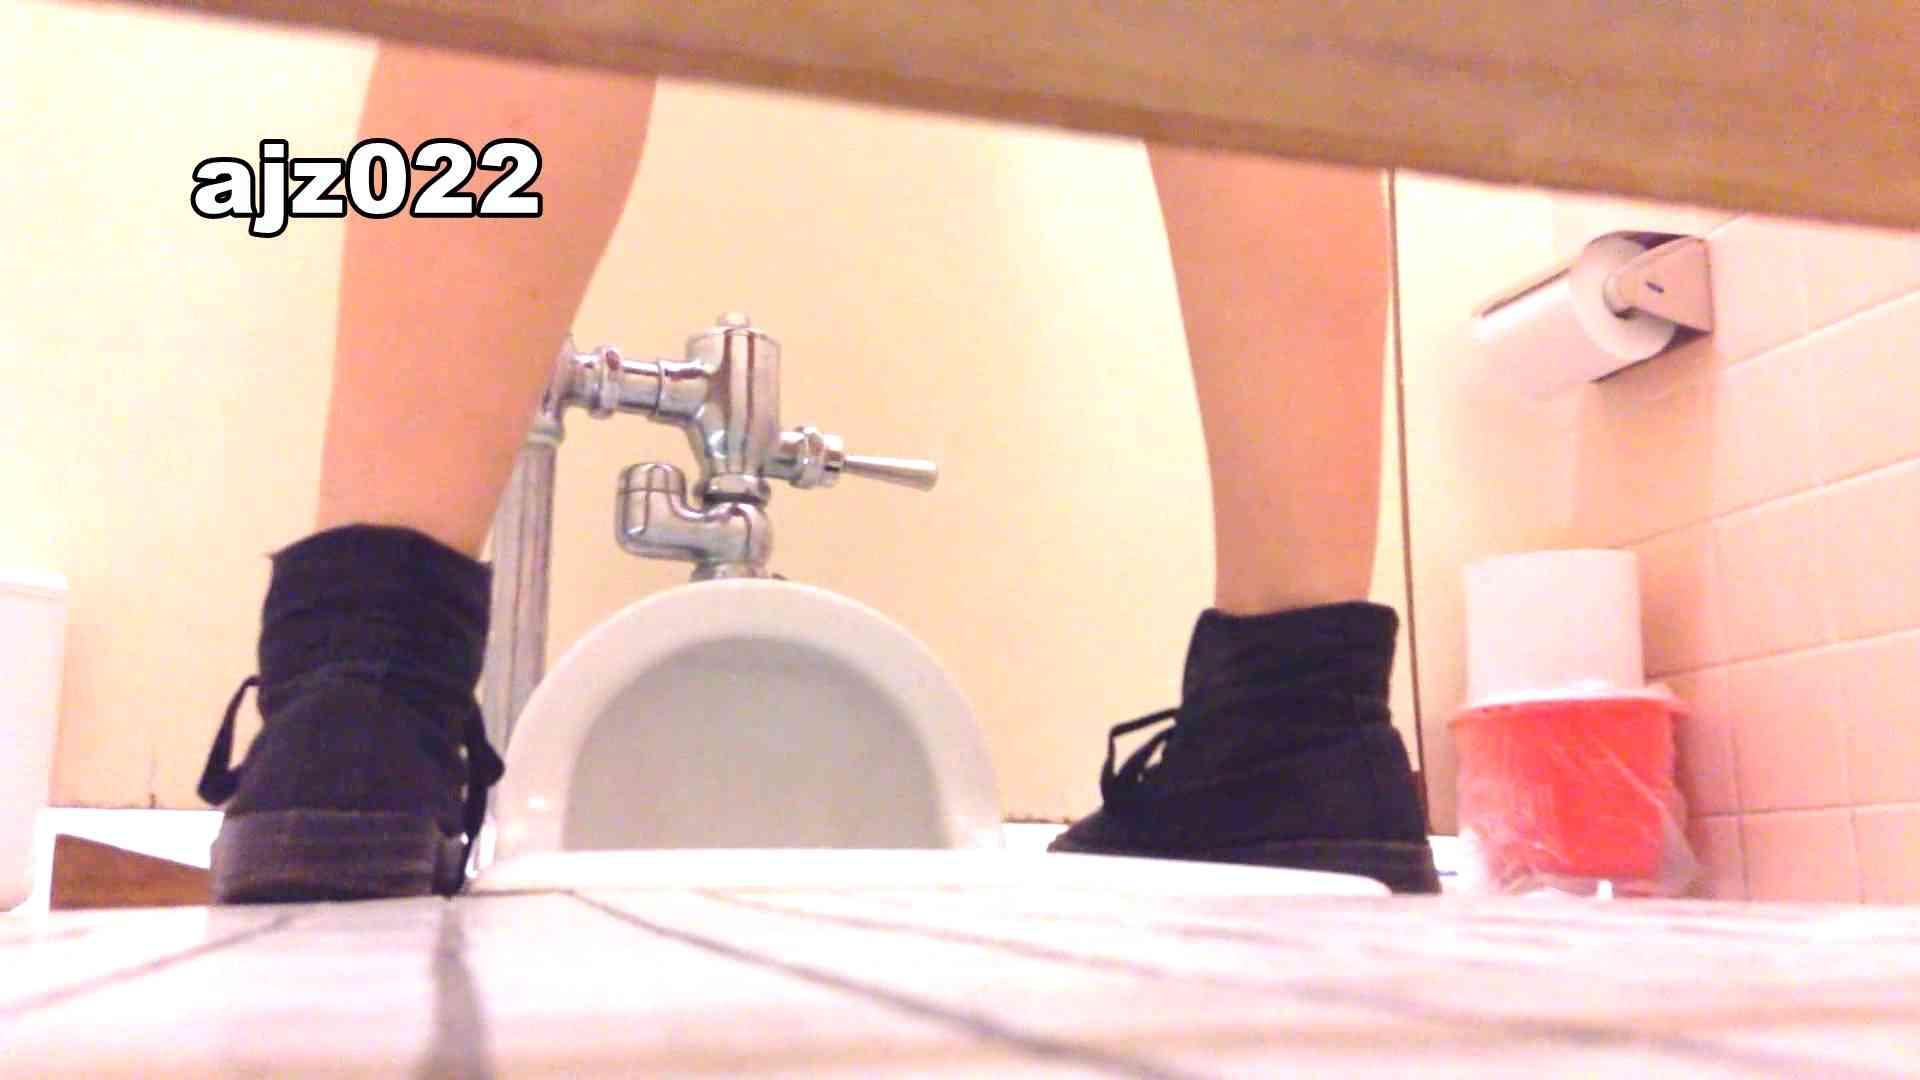 某有名大学女性洗面所 vol.22 洗面所突入 おめこ無修正画像 107pic 2